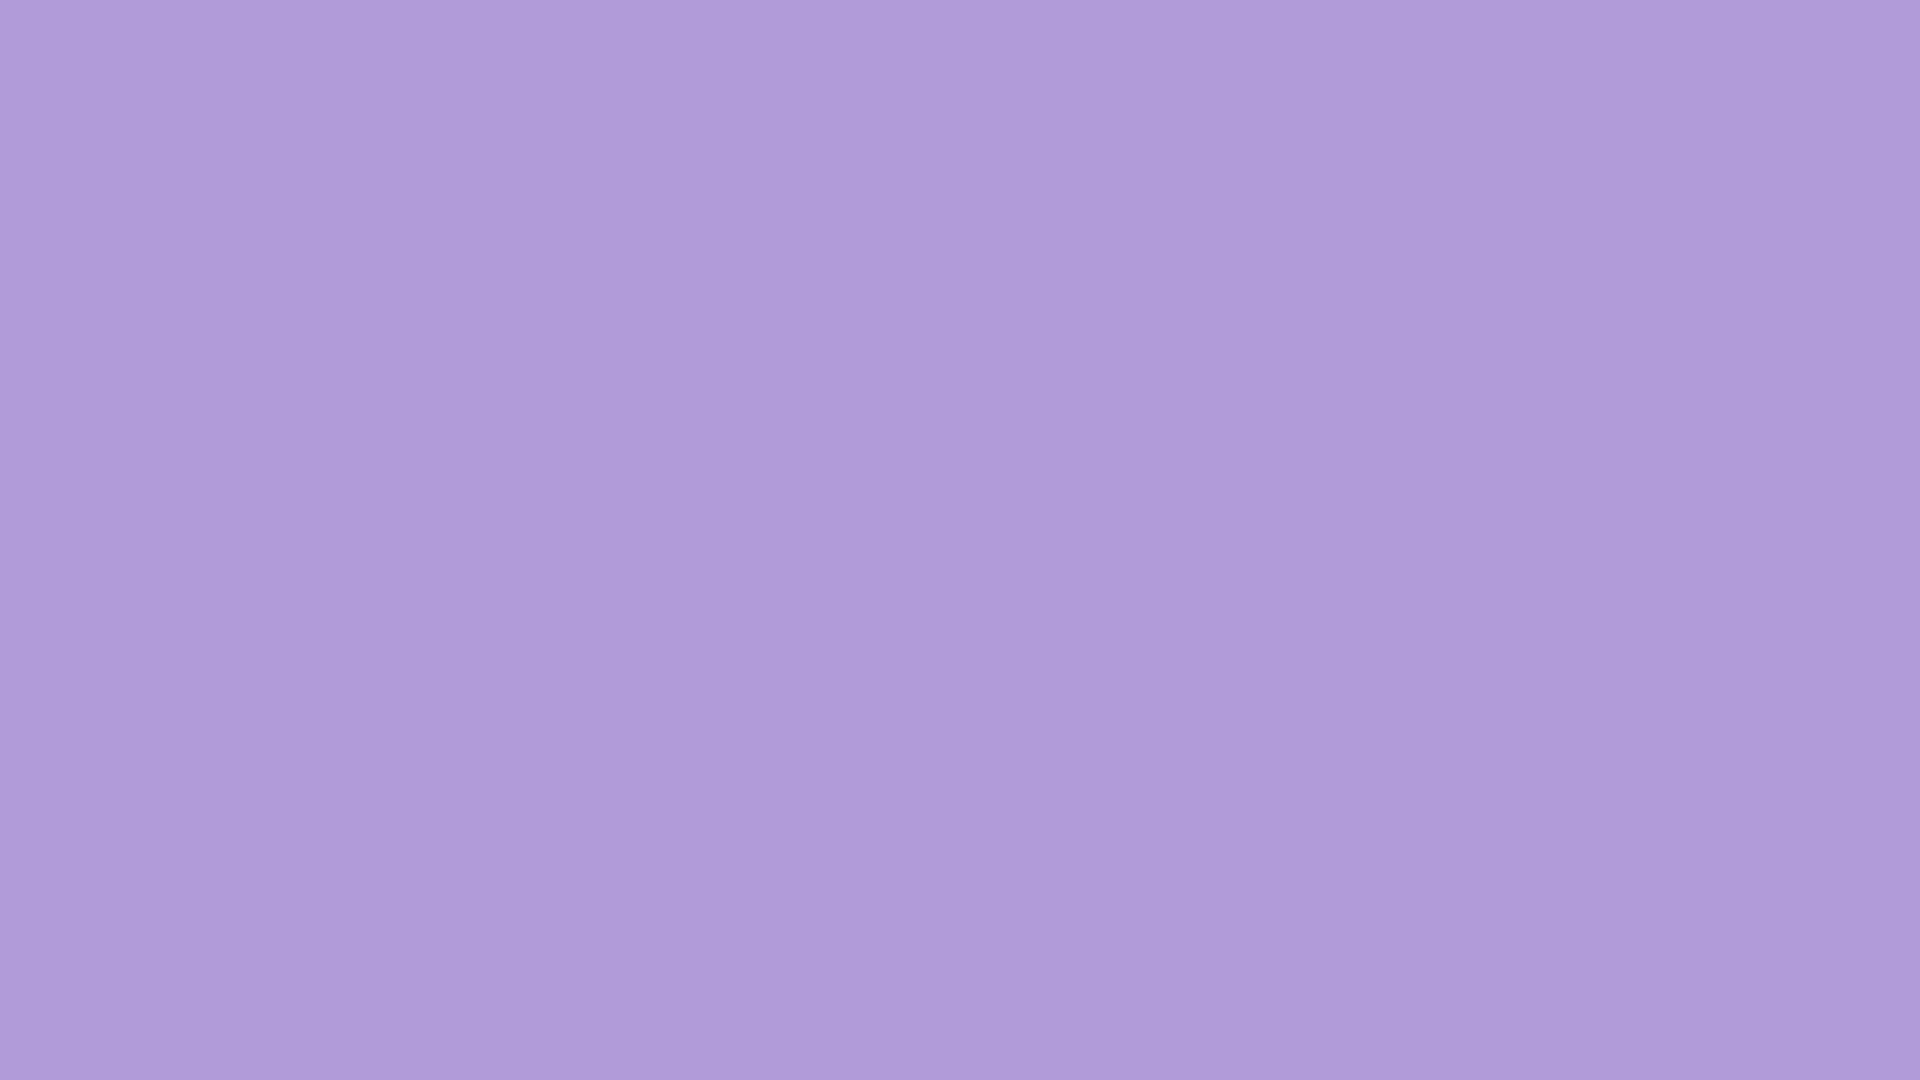 Pastel Purple Wallpaper Wide - Scerbos com